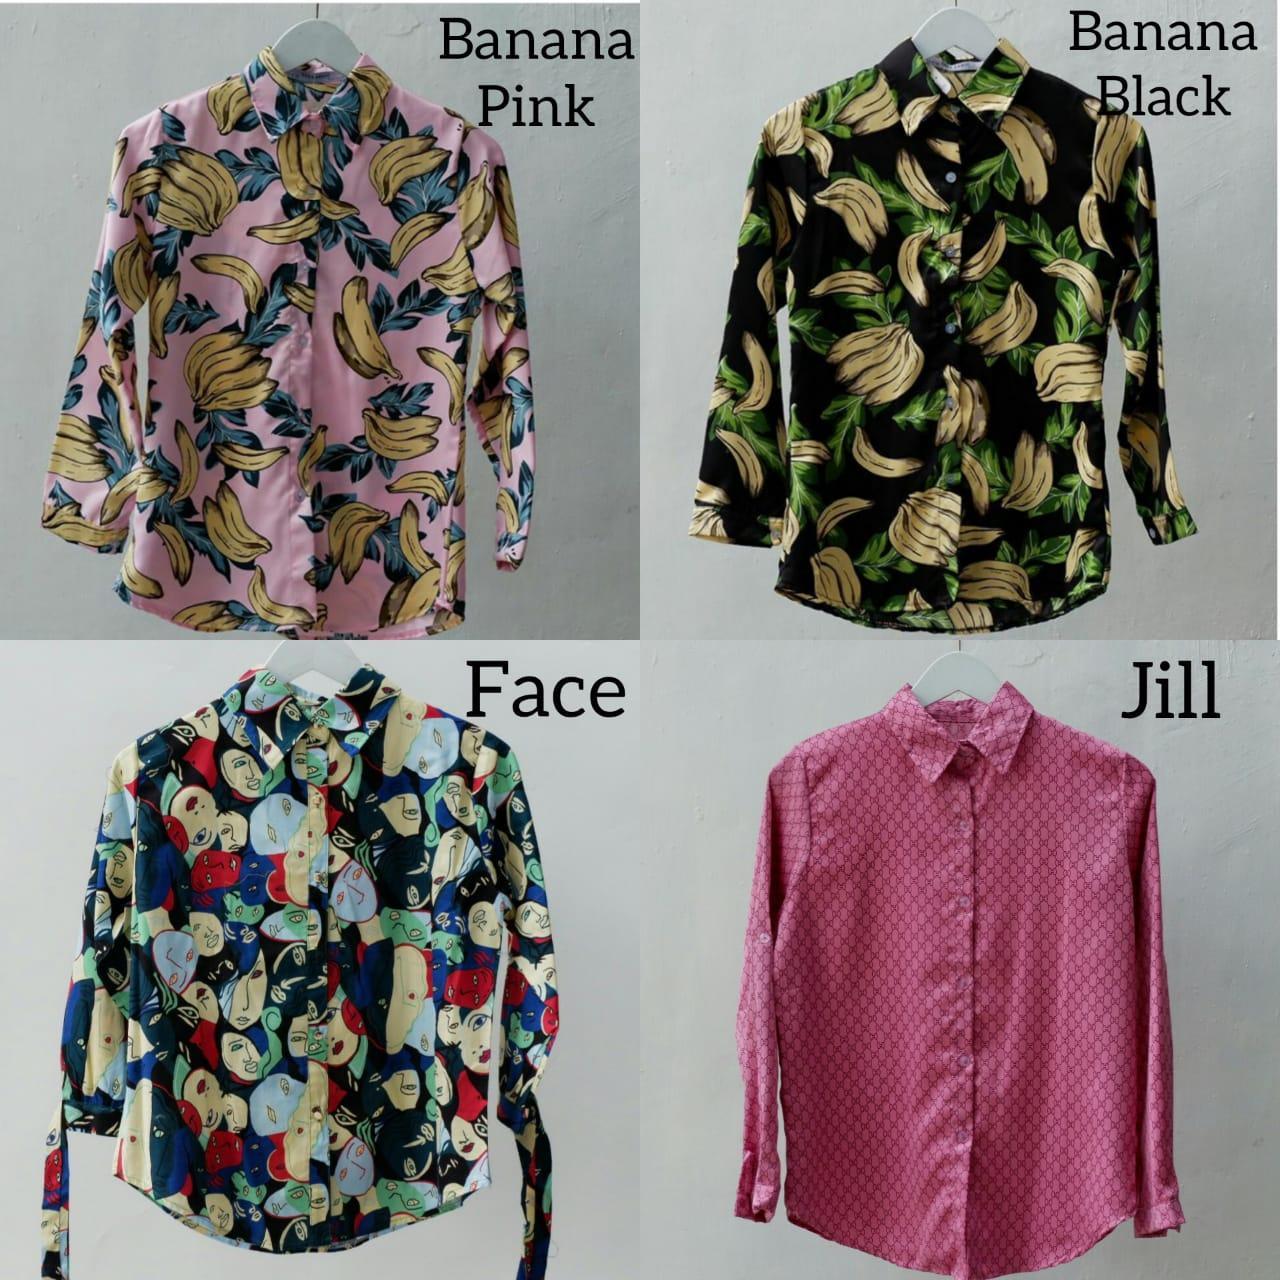 bevashop kemeja motif pattern shirt banana pisang muka face abstrak lengan panjang